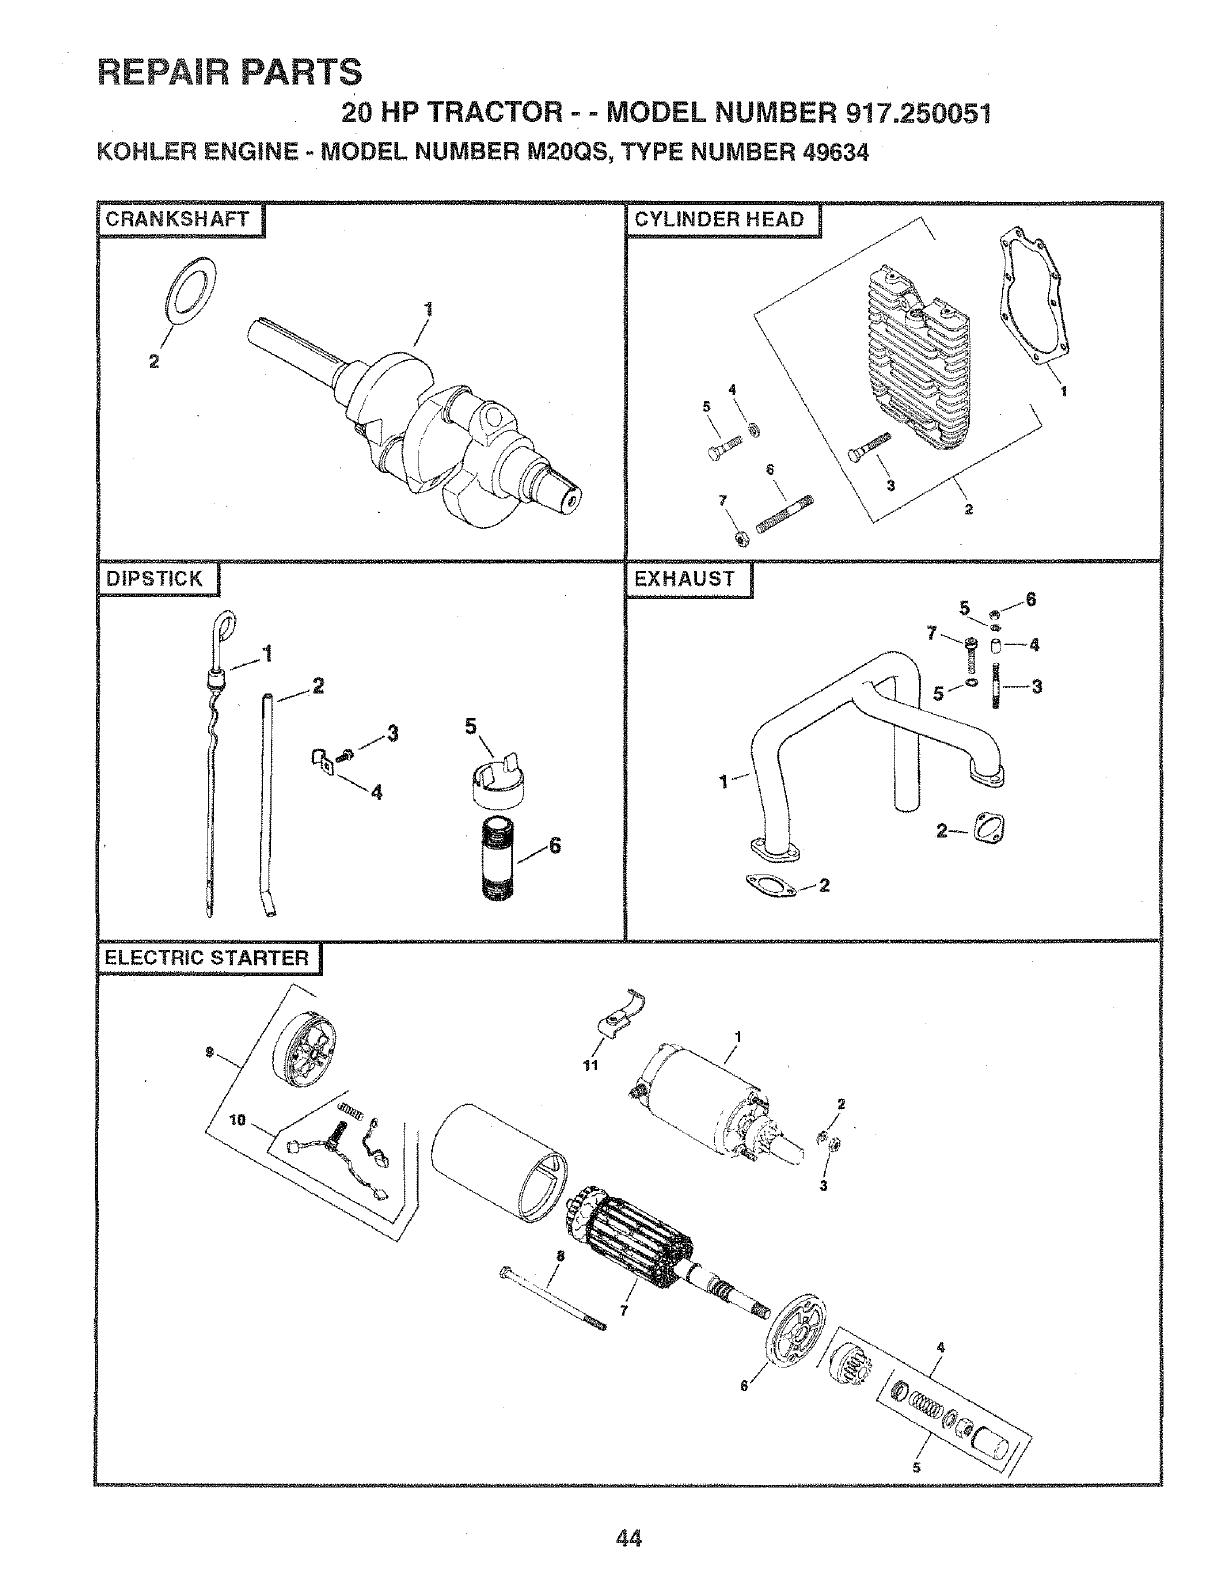 craftsman 917250051 user manual garden tractors manuals and guides Kohler K-Series Engine Specs repair parts